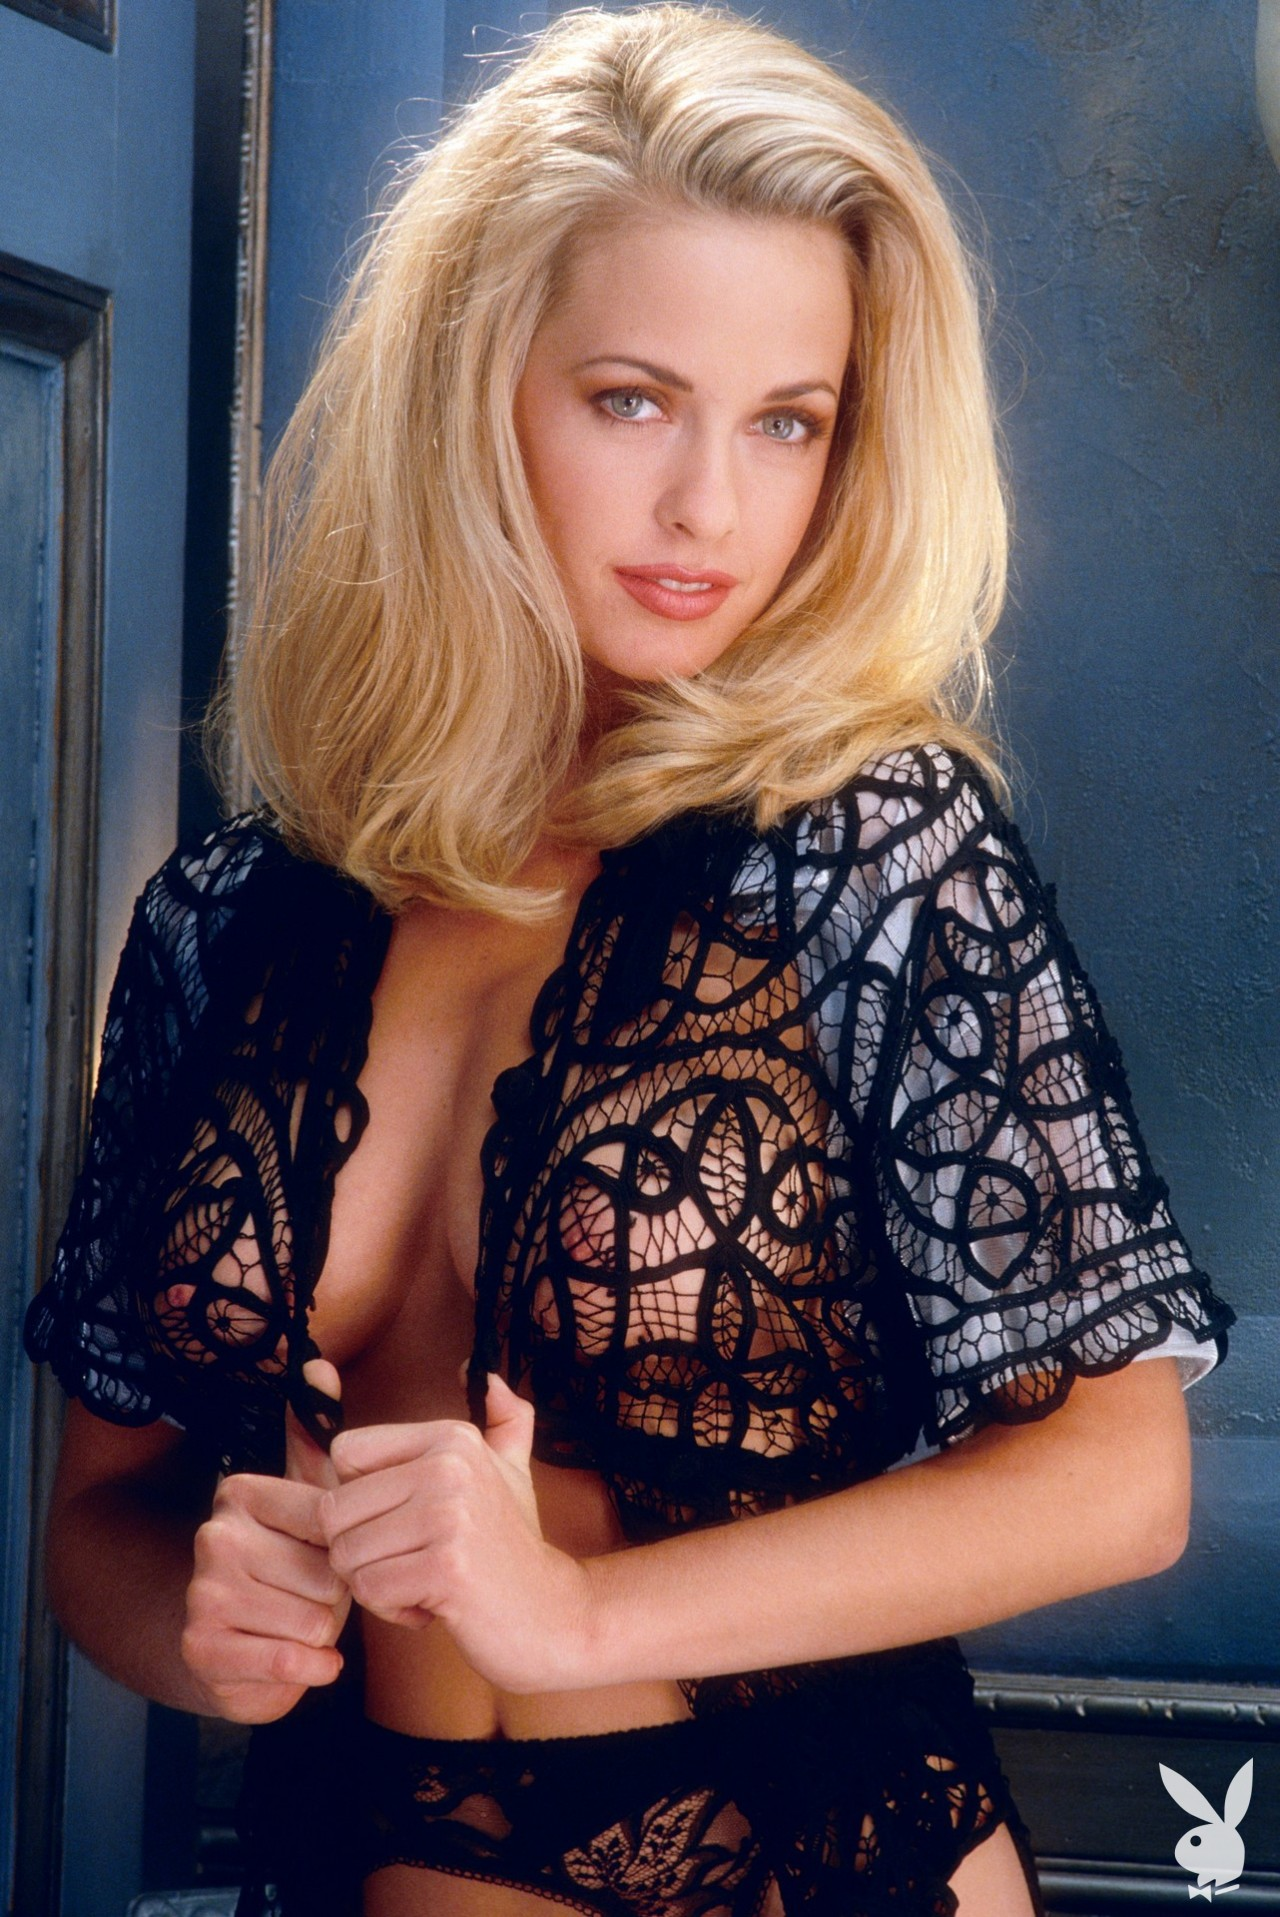 Playmate June 1995 Rhonda Adams Playboy Plus (5)